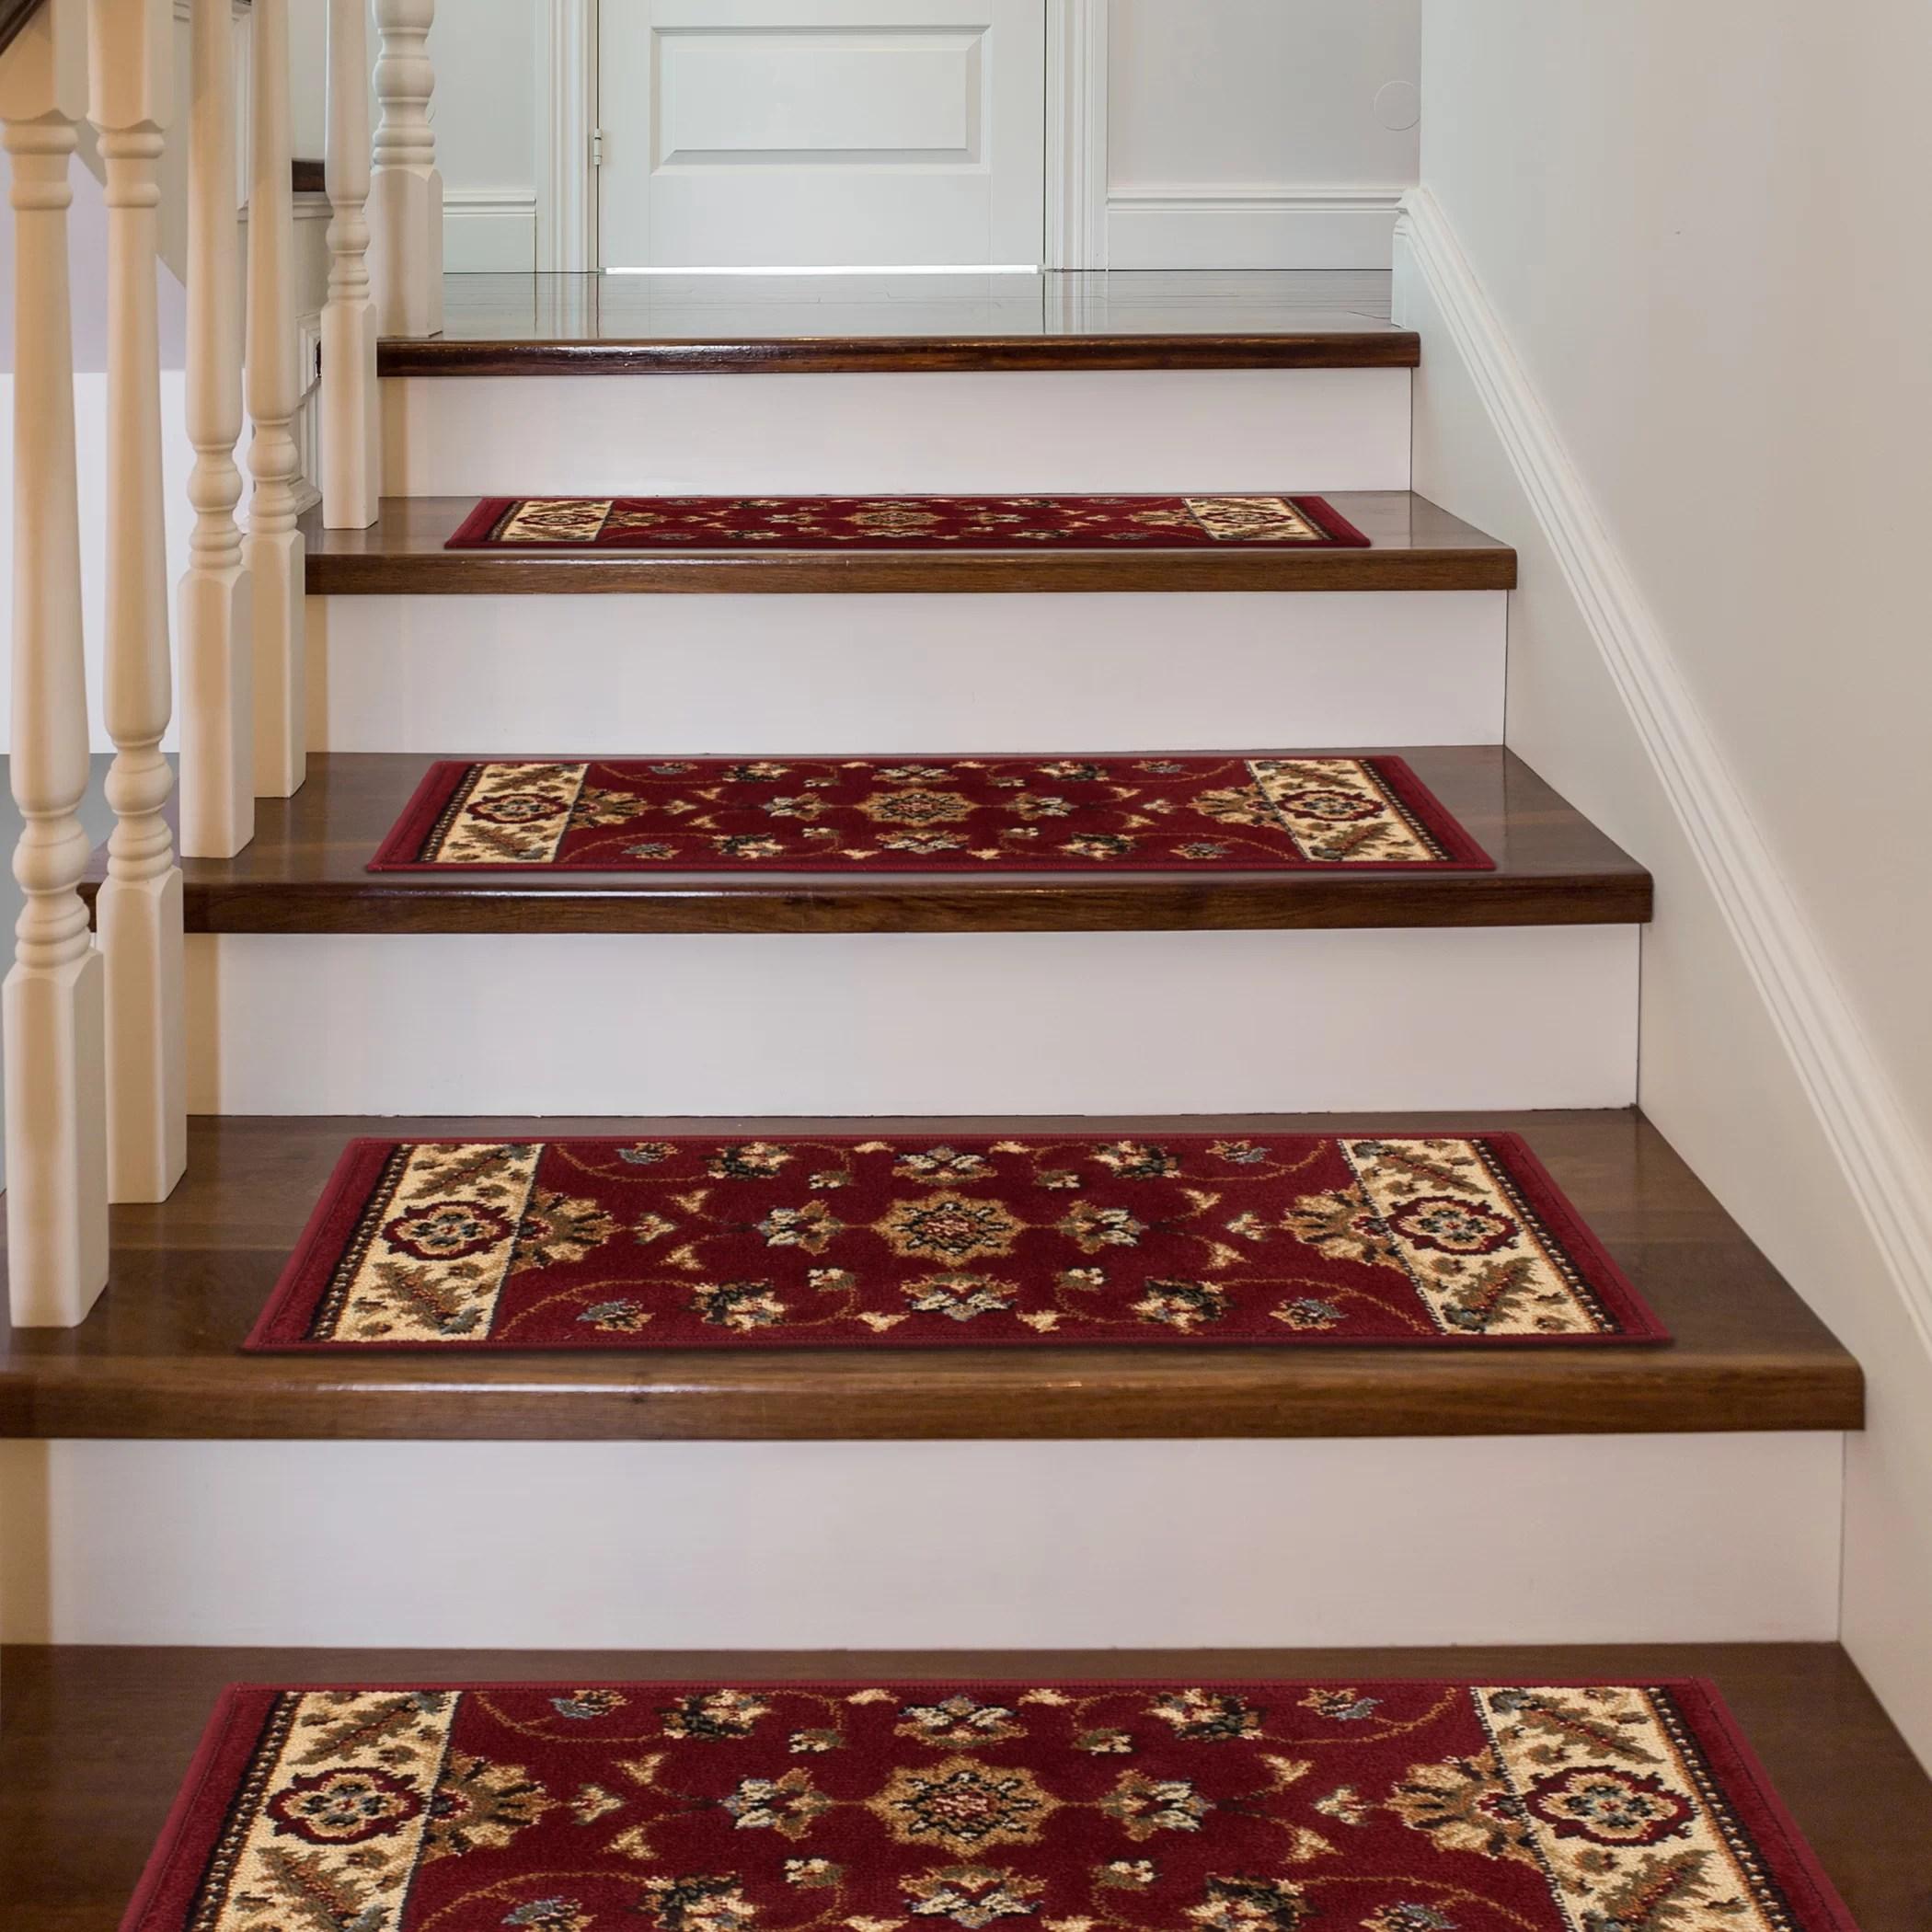 Astoria Grand Athol Stair Tread Reviews Wayfair | Plush Carpet Stair Treads | True Bullnose Carpet | Super Soft | Anti Slip | Wool Carpet | Wall Carpet